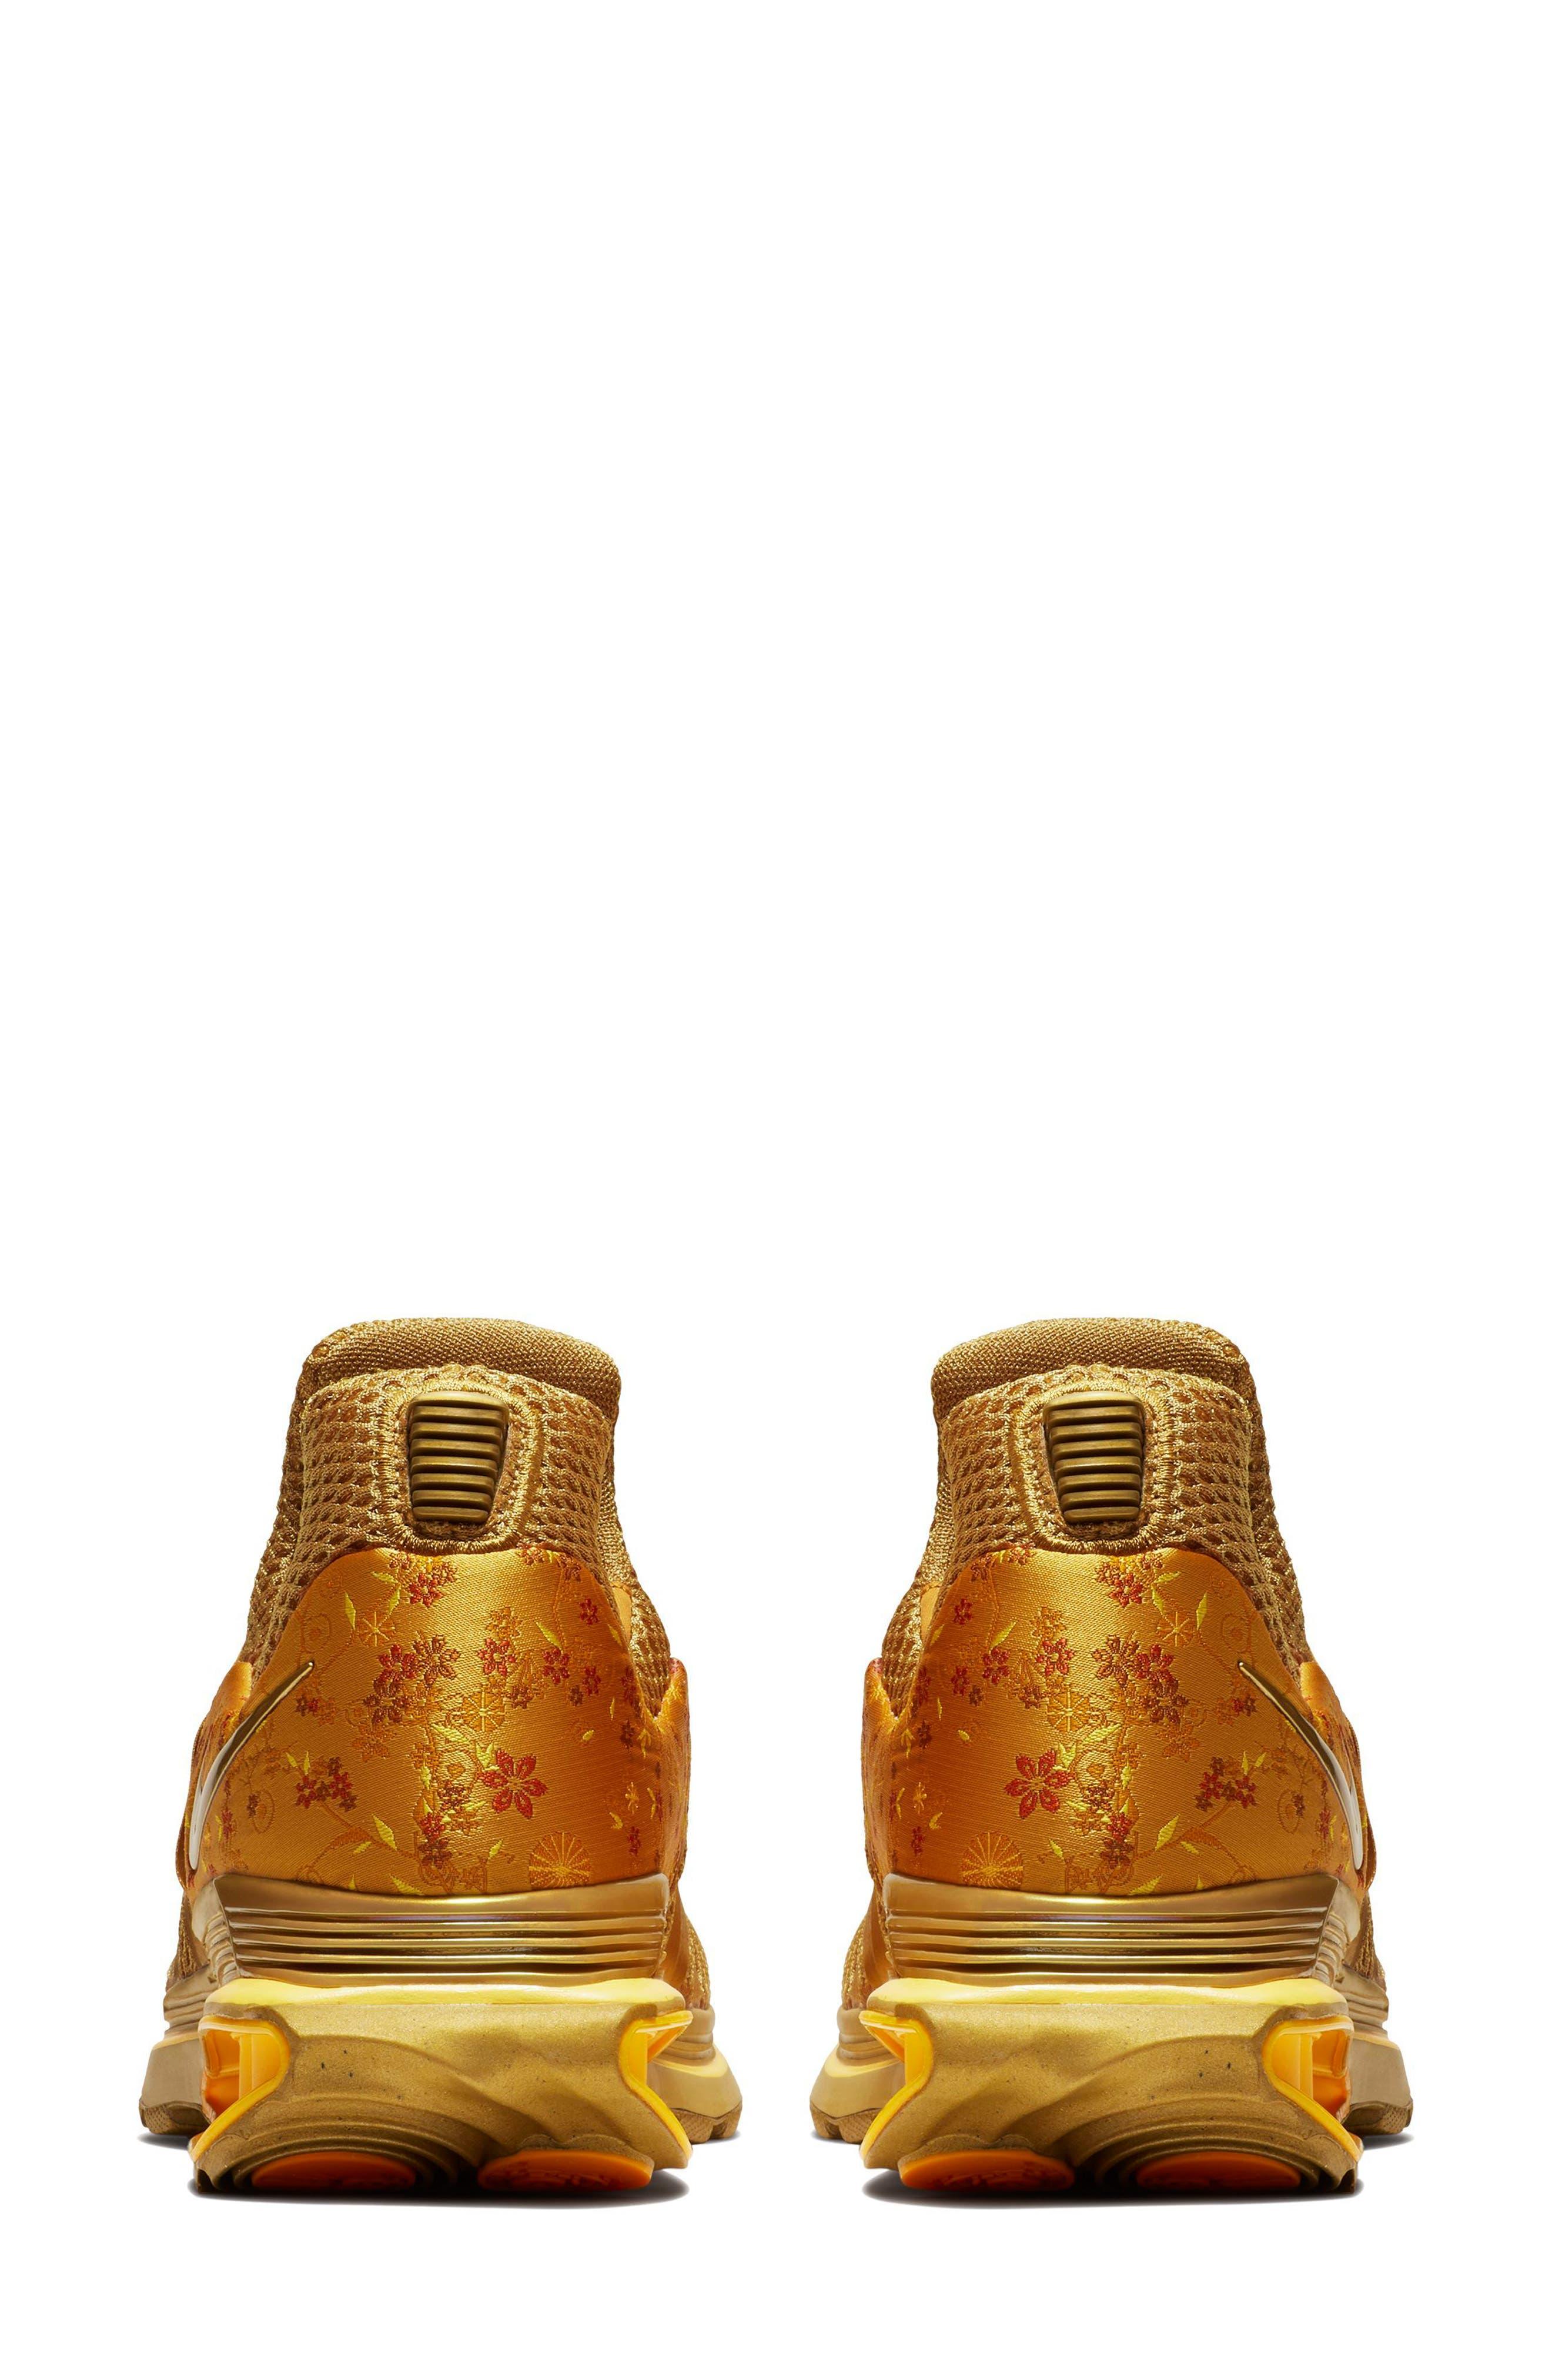 Shox Gravity Sneaker,                             Alternate thumbnail 2, color,                             Metallic Gold/ Metallic Gold